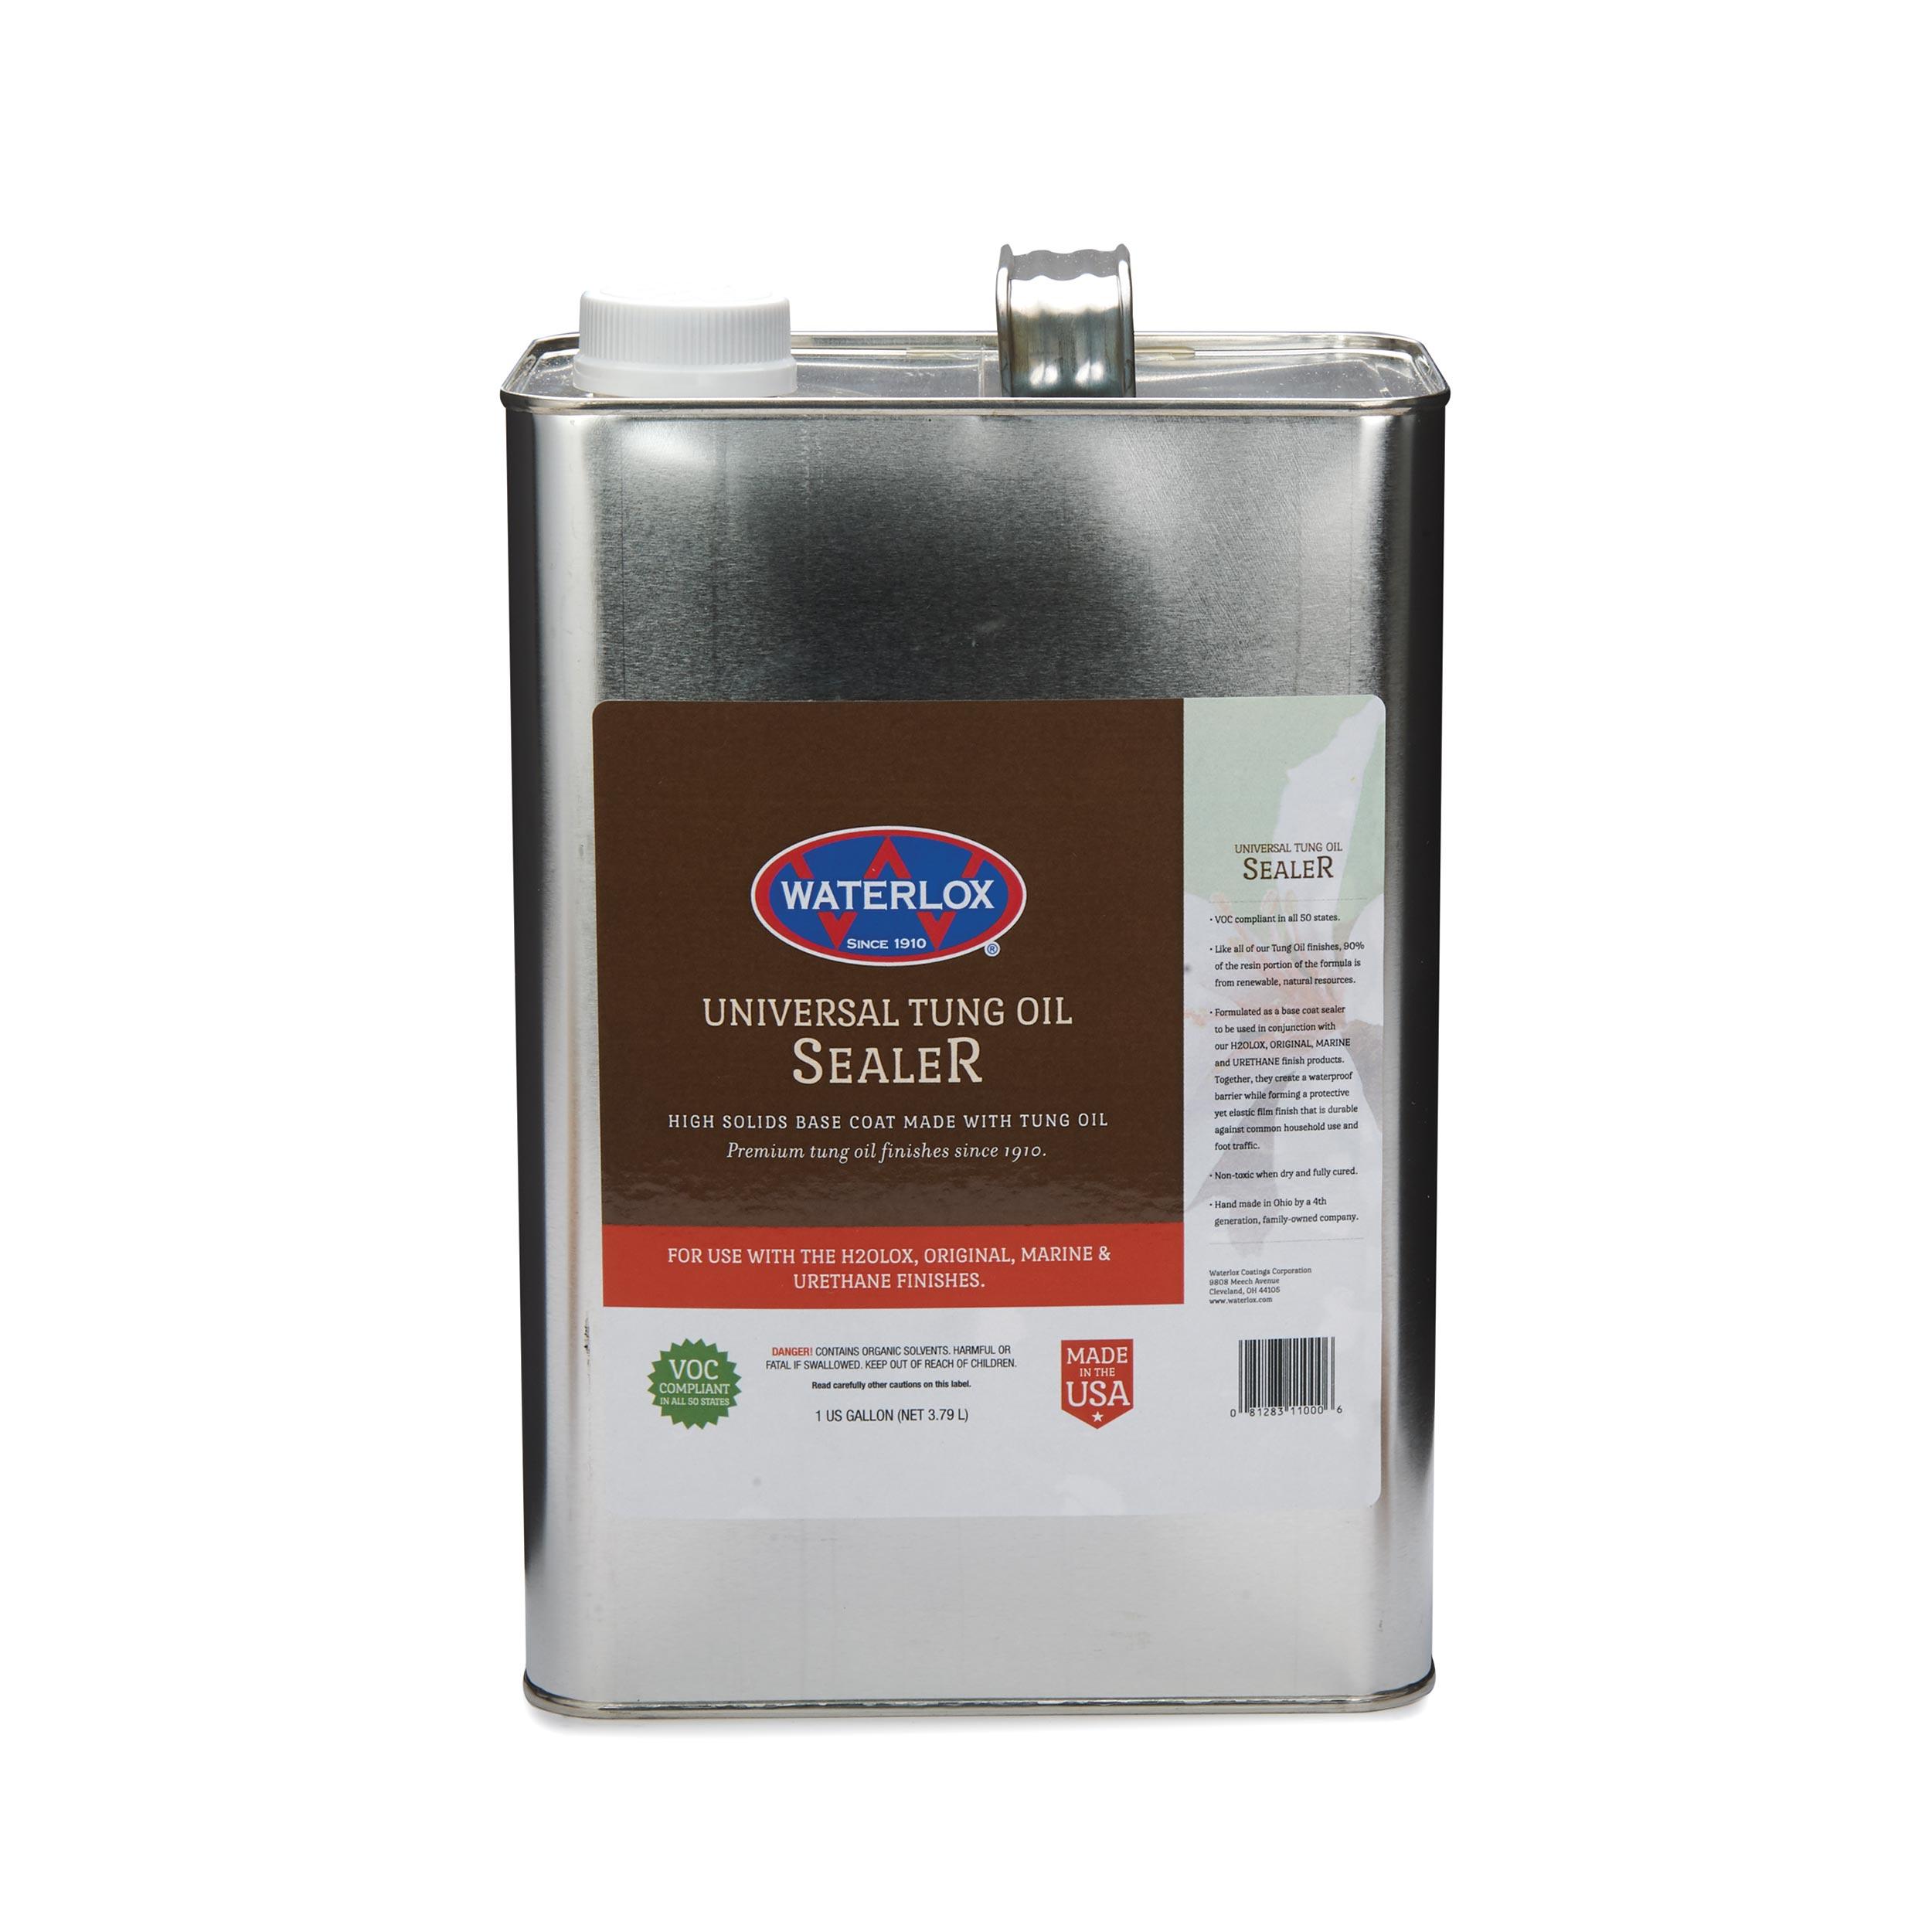 Universal Tung Oil Sealer Gallon